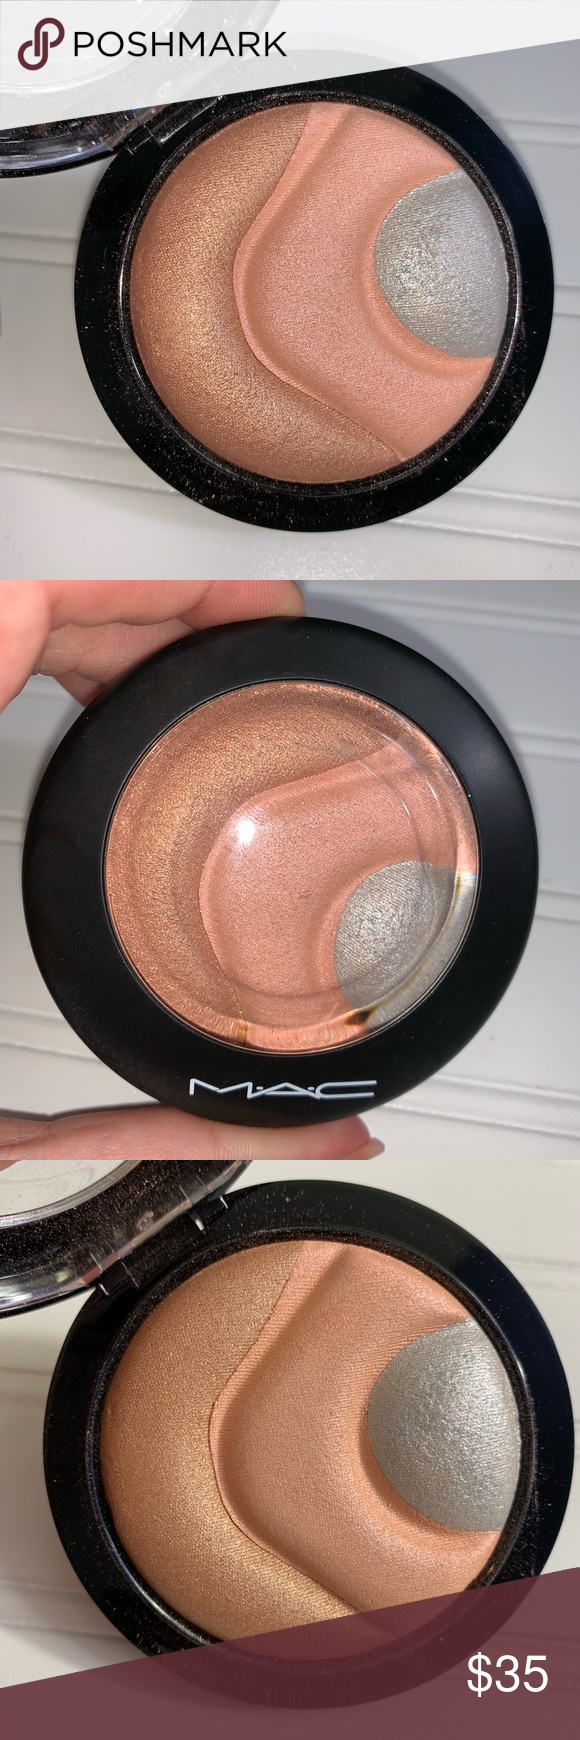 thestylemongers: mac cosmetics makeup images